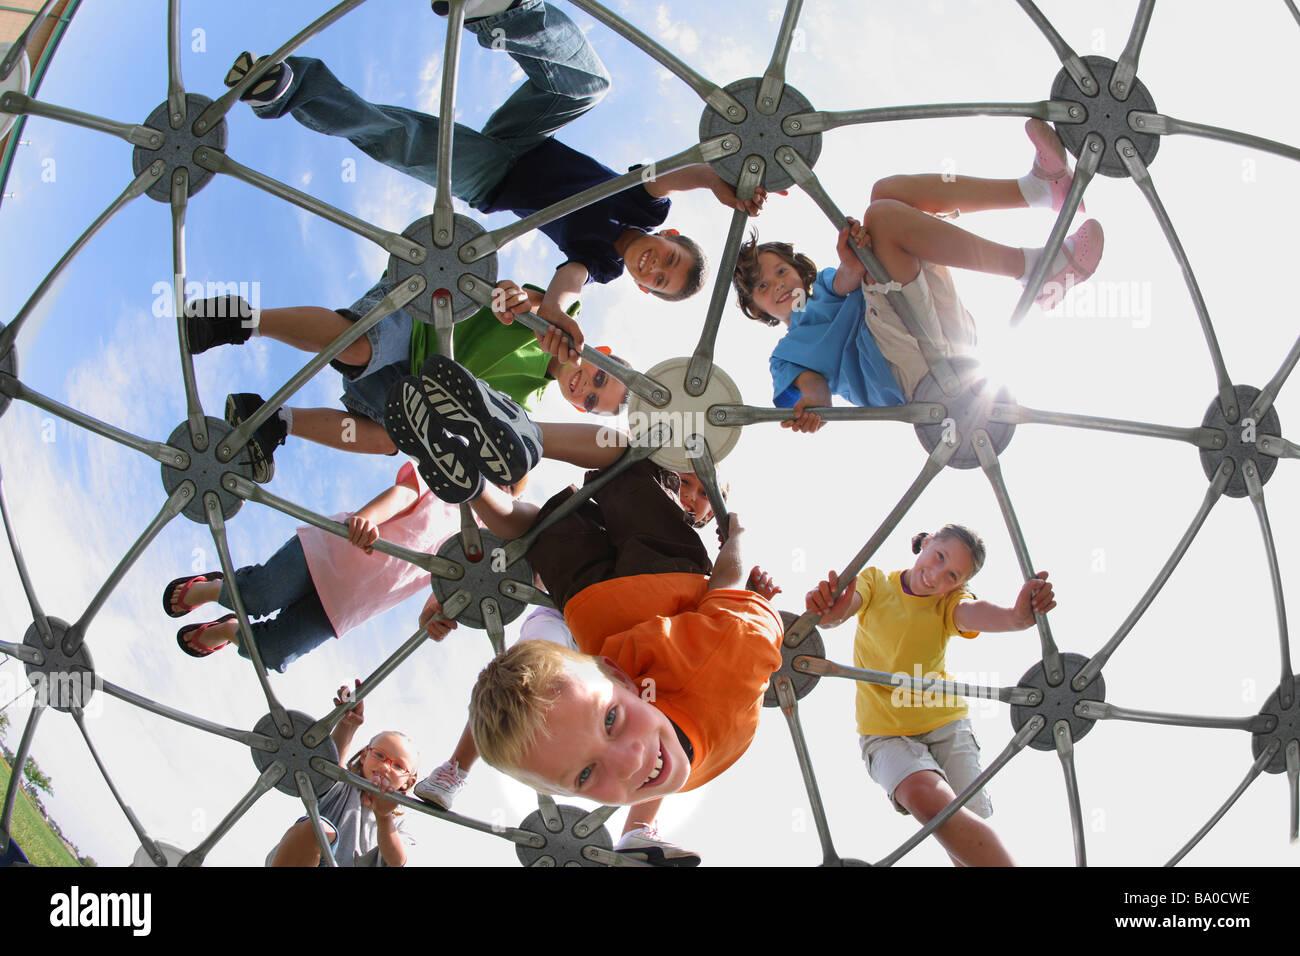 School children on playground structure - Stock Image